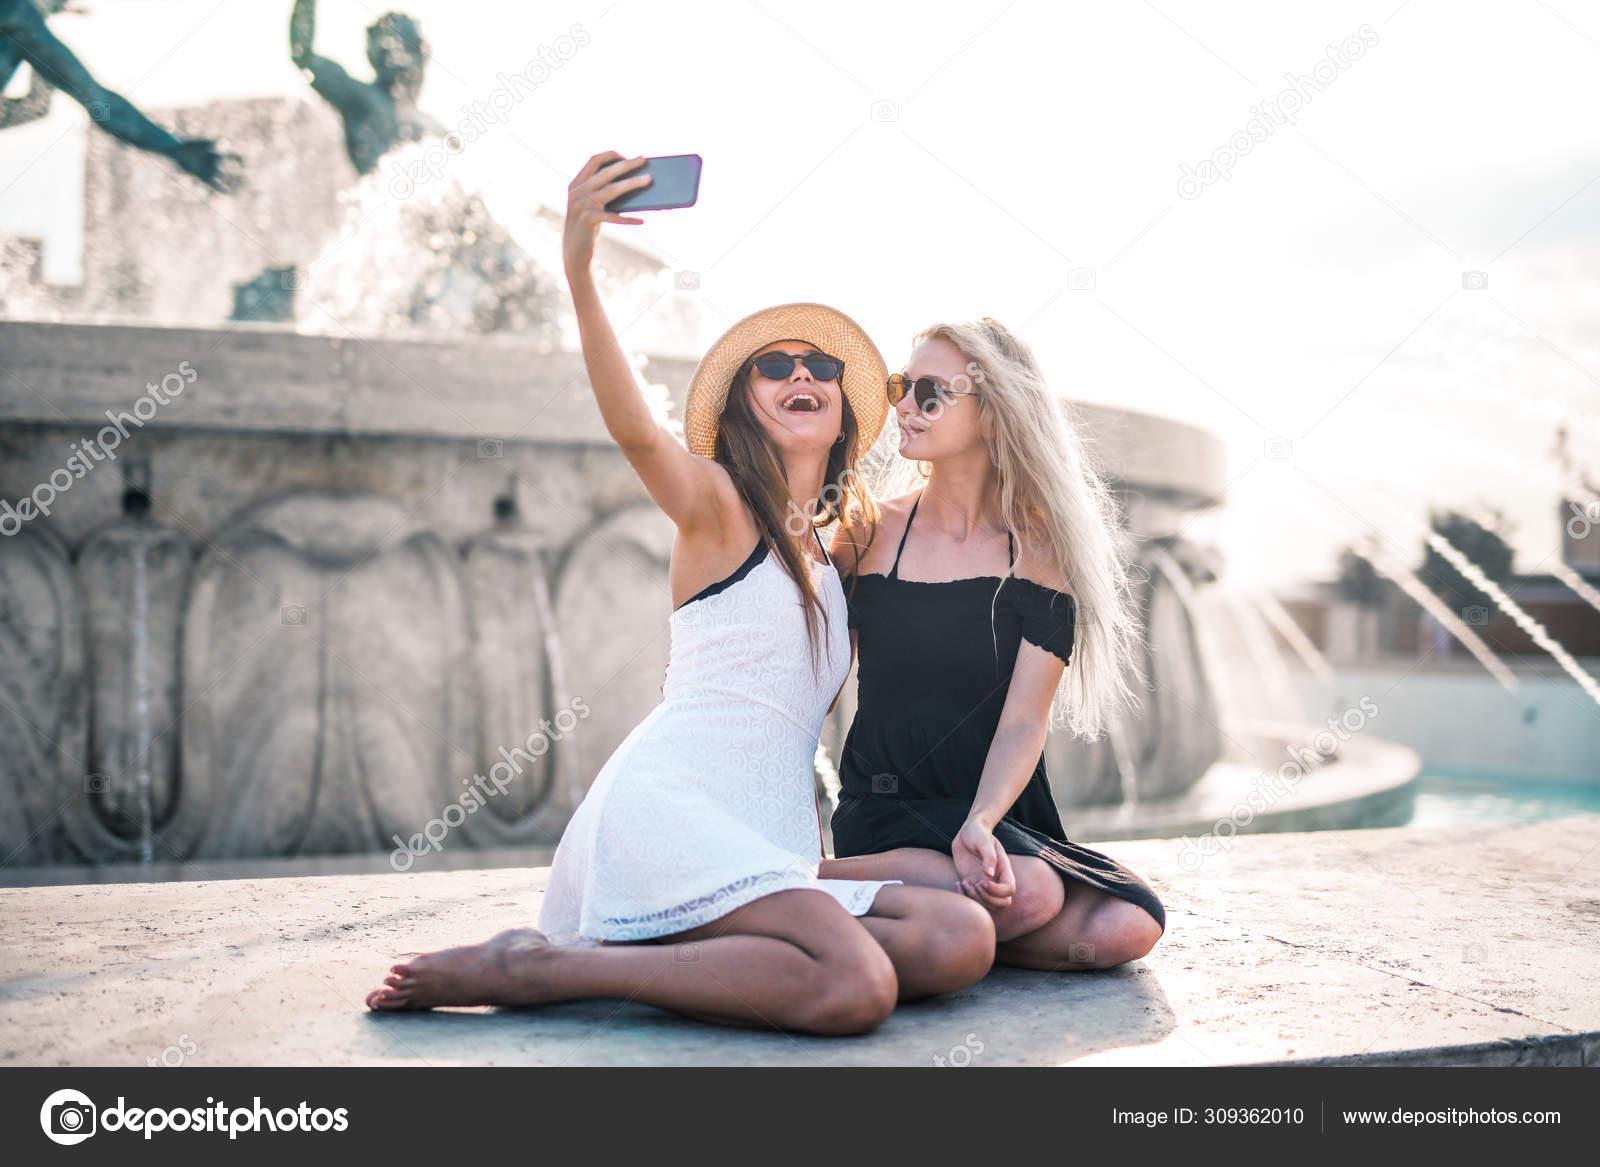 https://st4.depositphotos.com/1008939/30936/i/1600/depositphotos_309362010-stock-photo-two-girl-takes-selfie-city.jpg